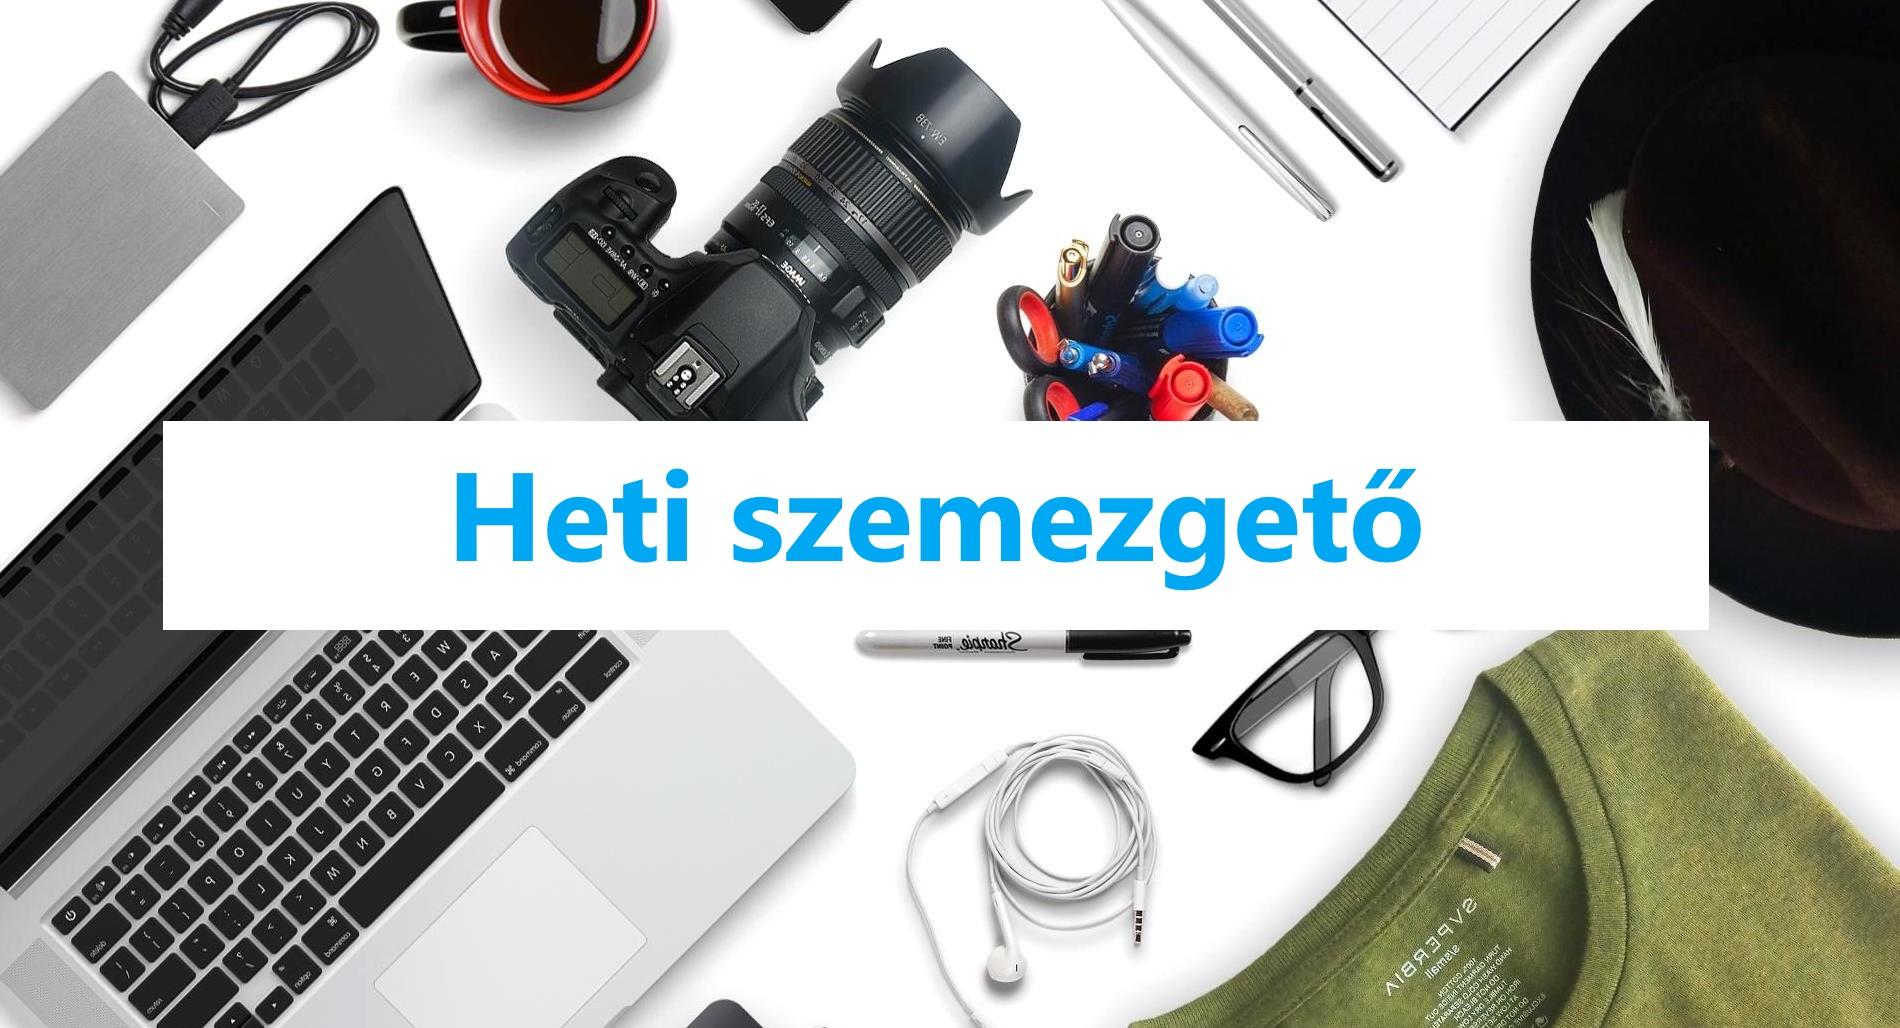 heti_szemezgeto_uj_41.jpg